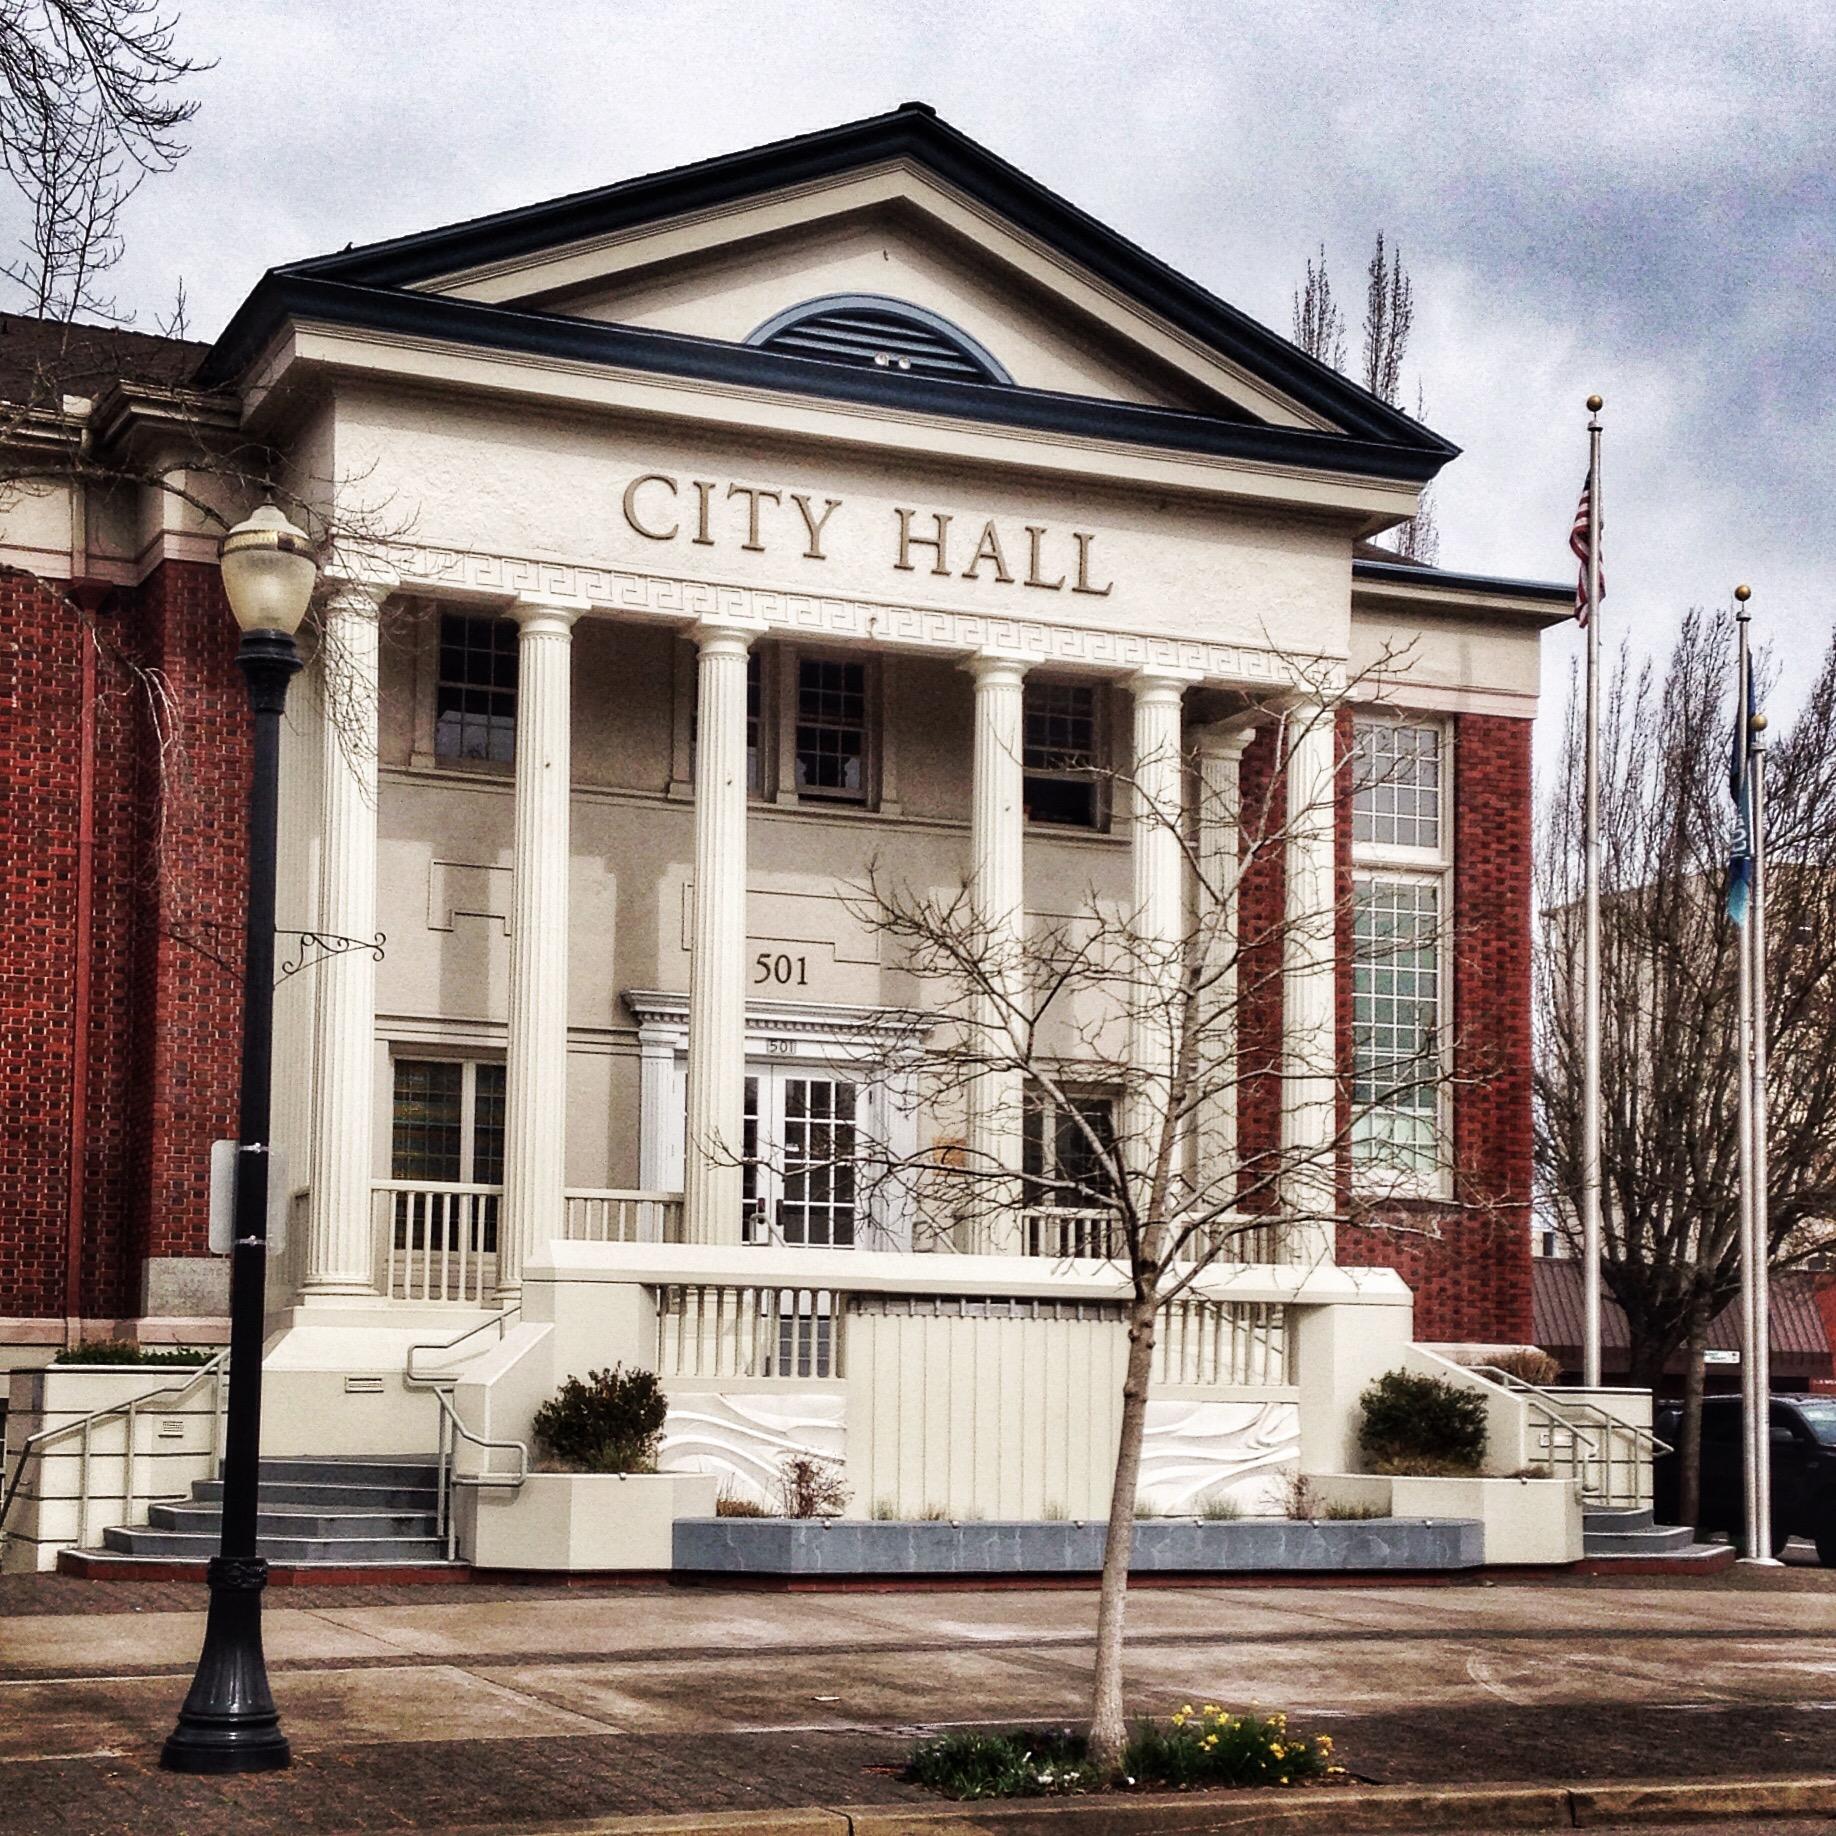 Corvallis, Oregon - City Hall